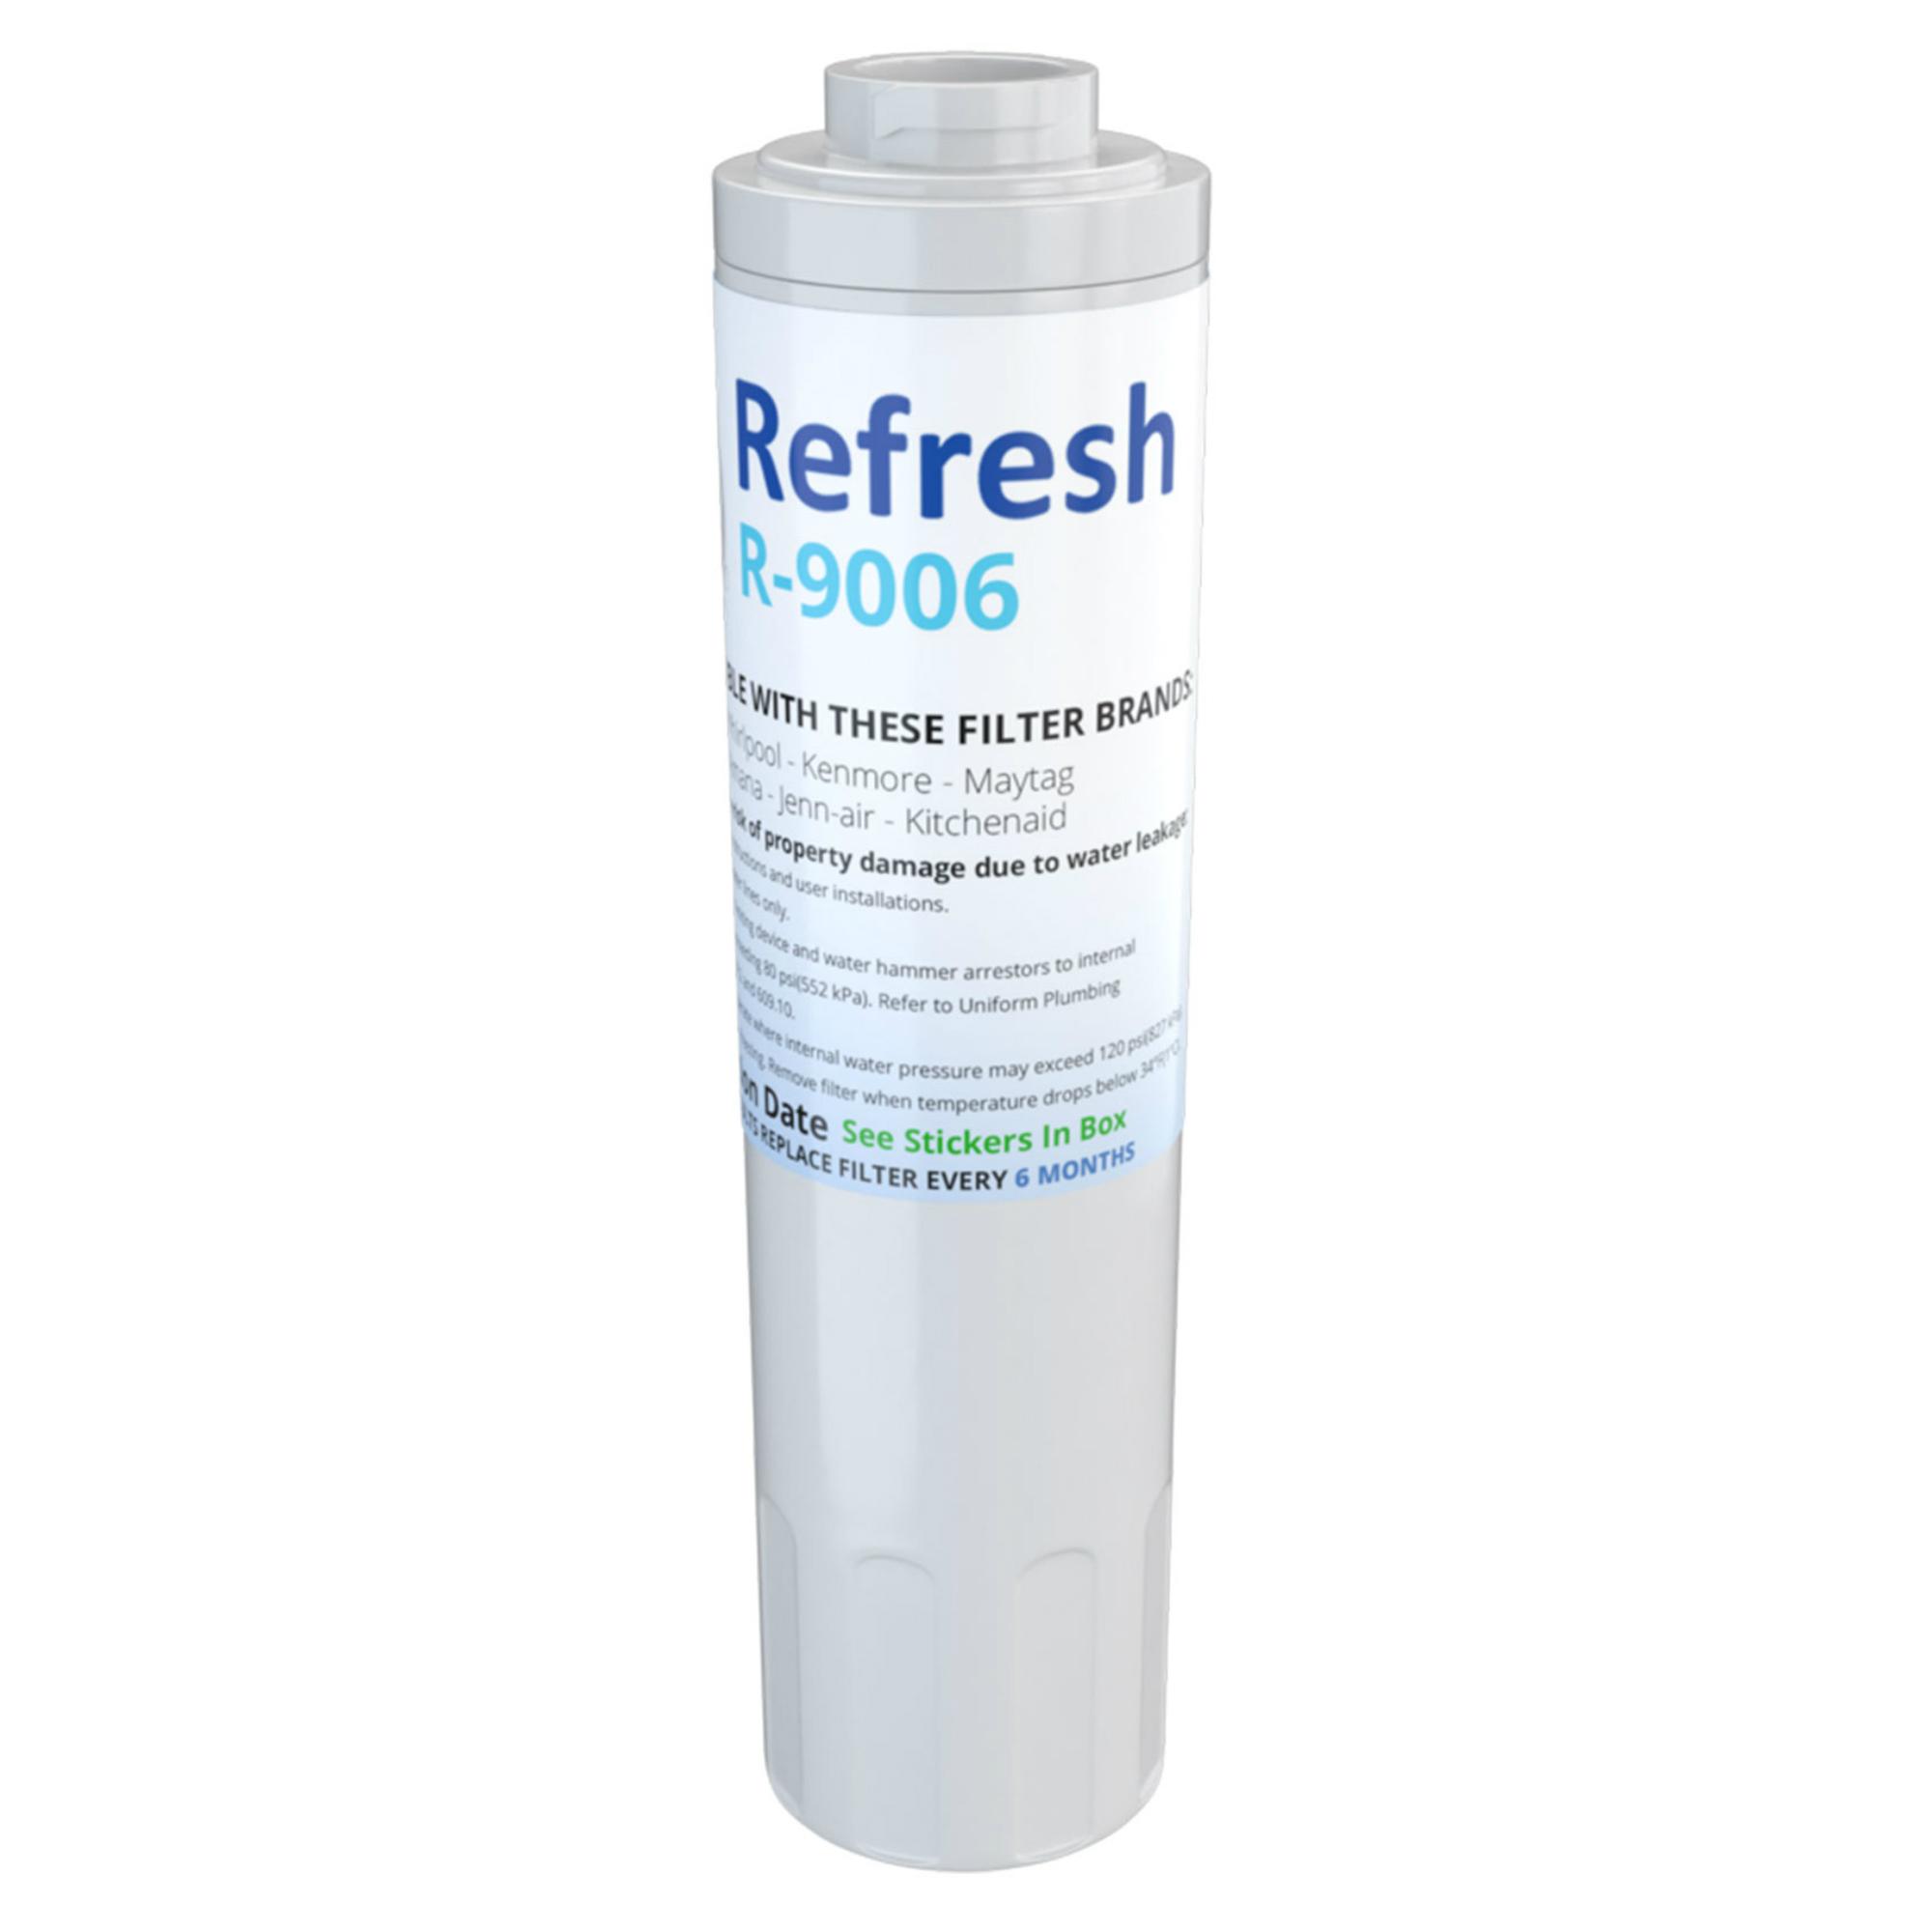 Refresh R-9006 Refrigerator Water Filter For Maytag UKF8001 & Whirlpool WRX735SDBM